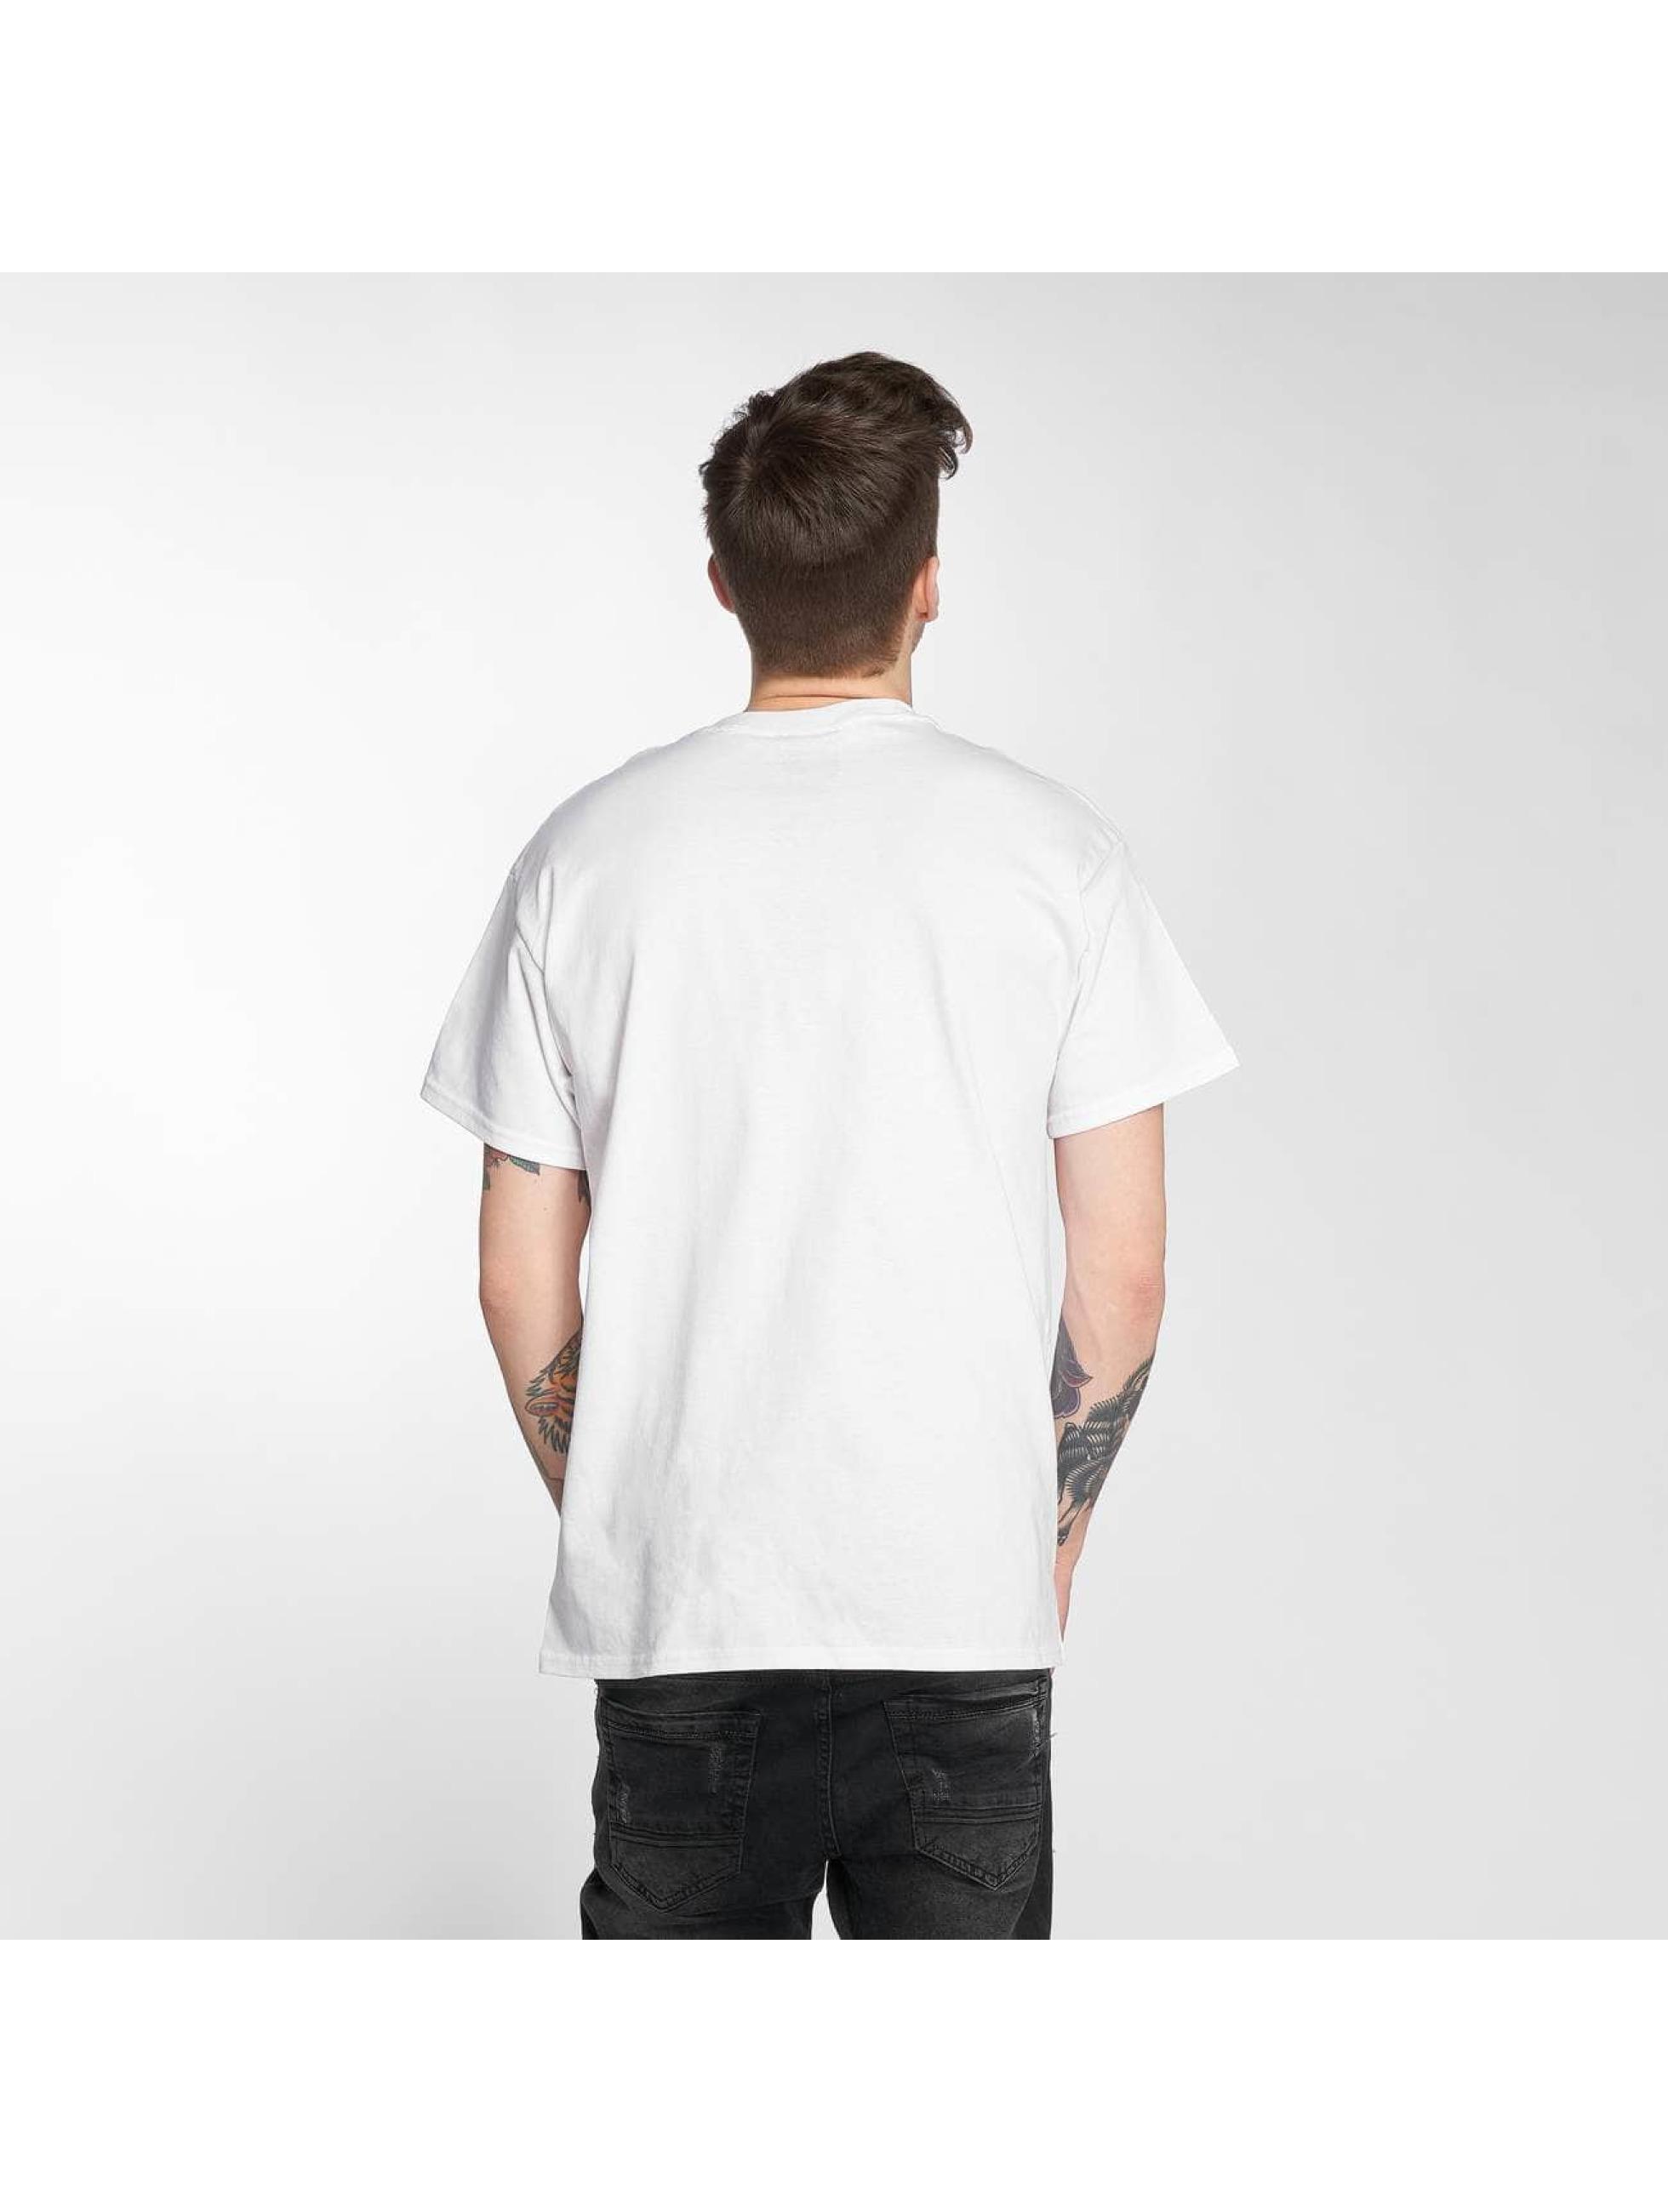 Joker Camiseta LowLow blanco